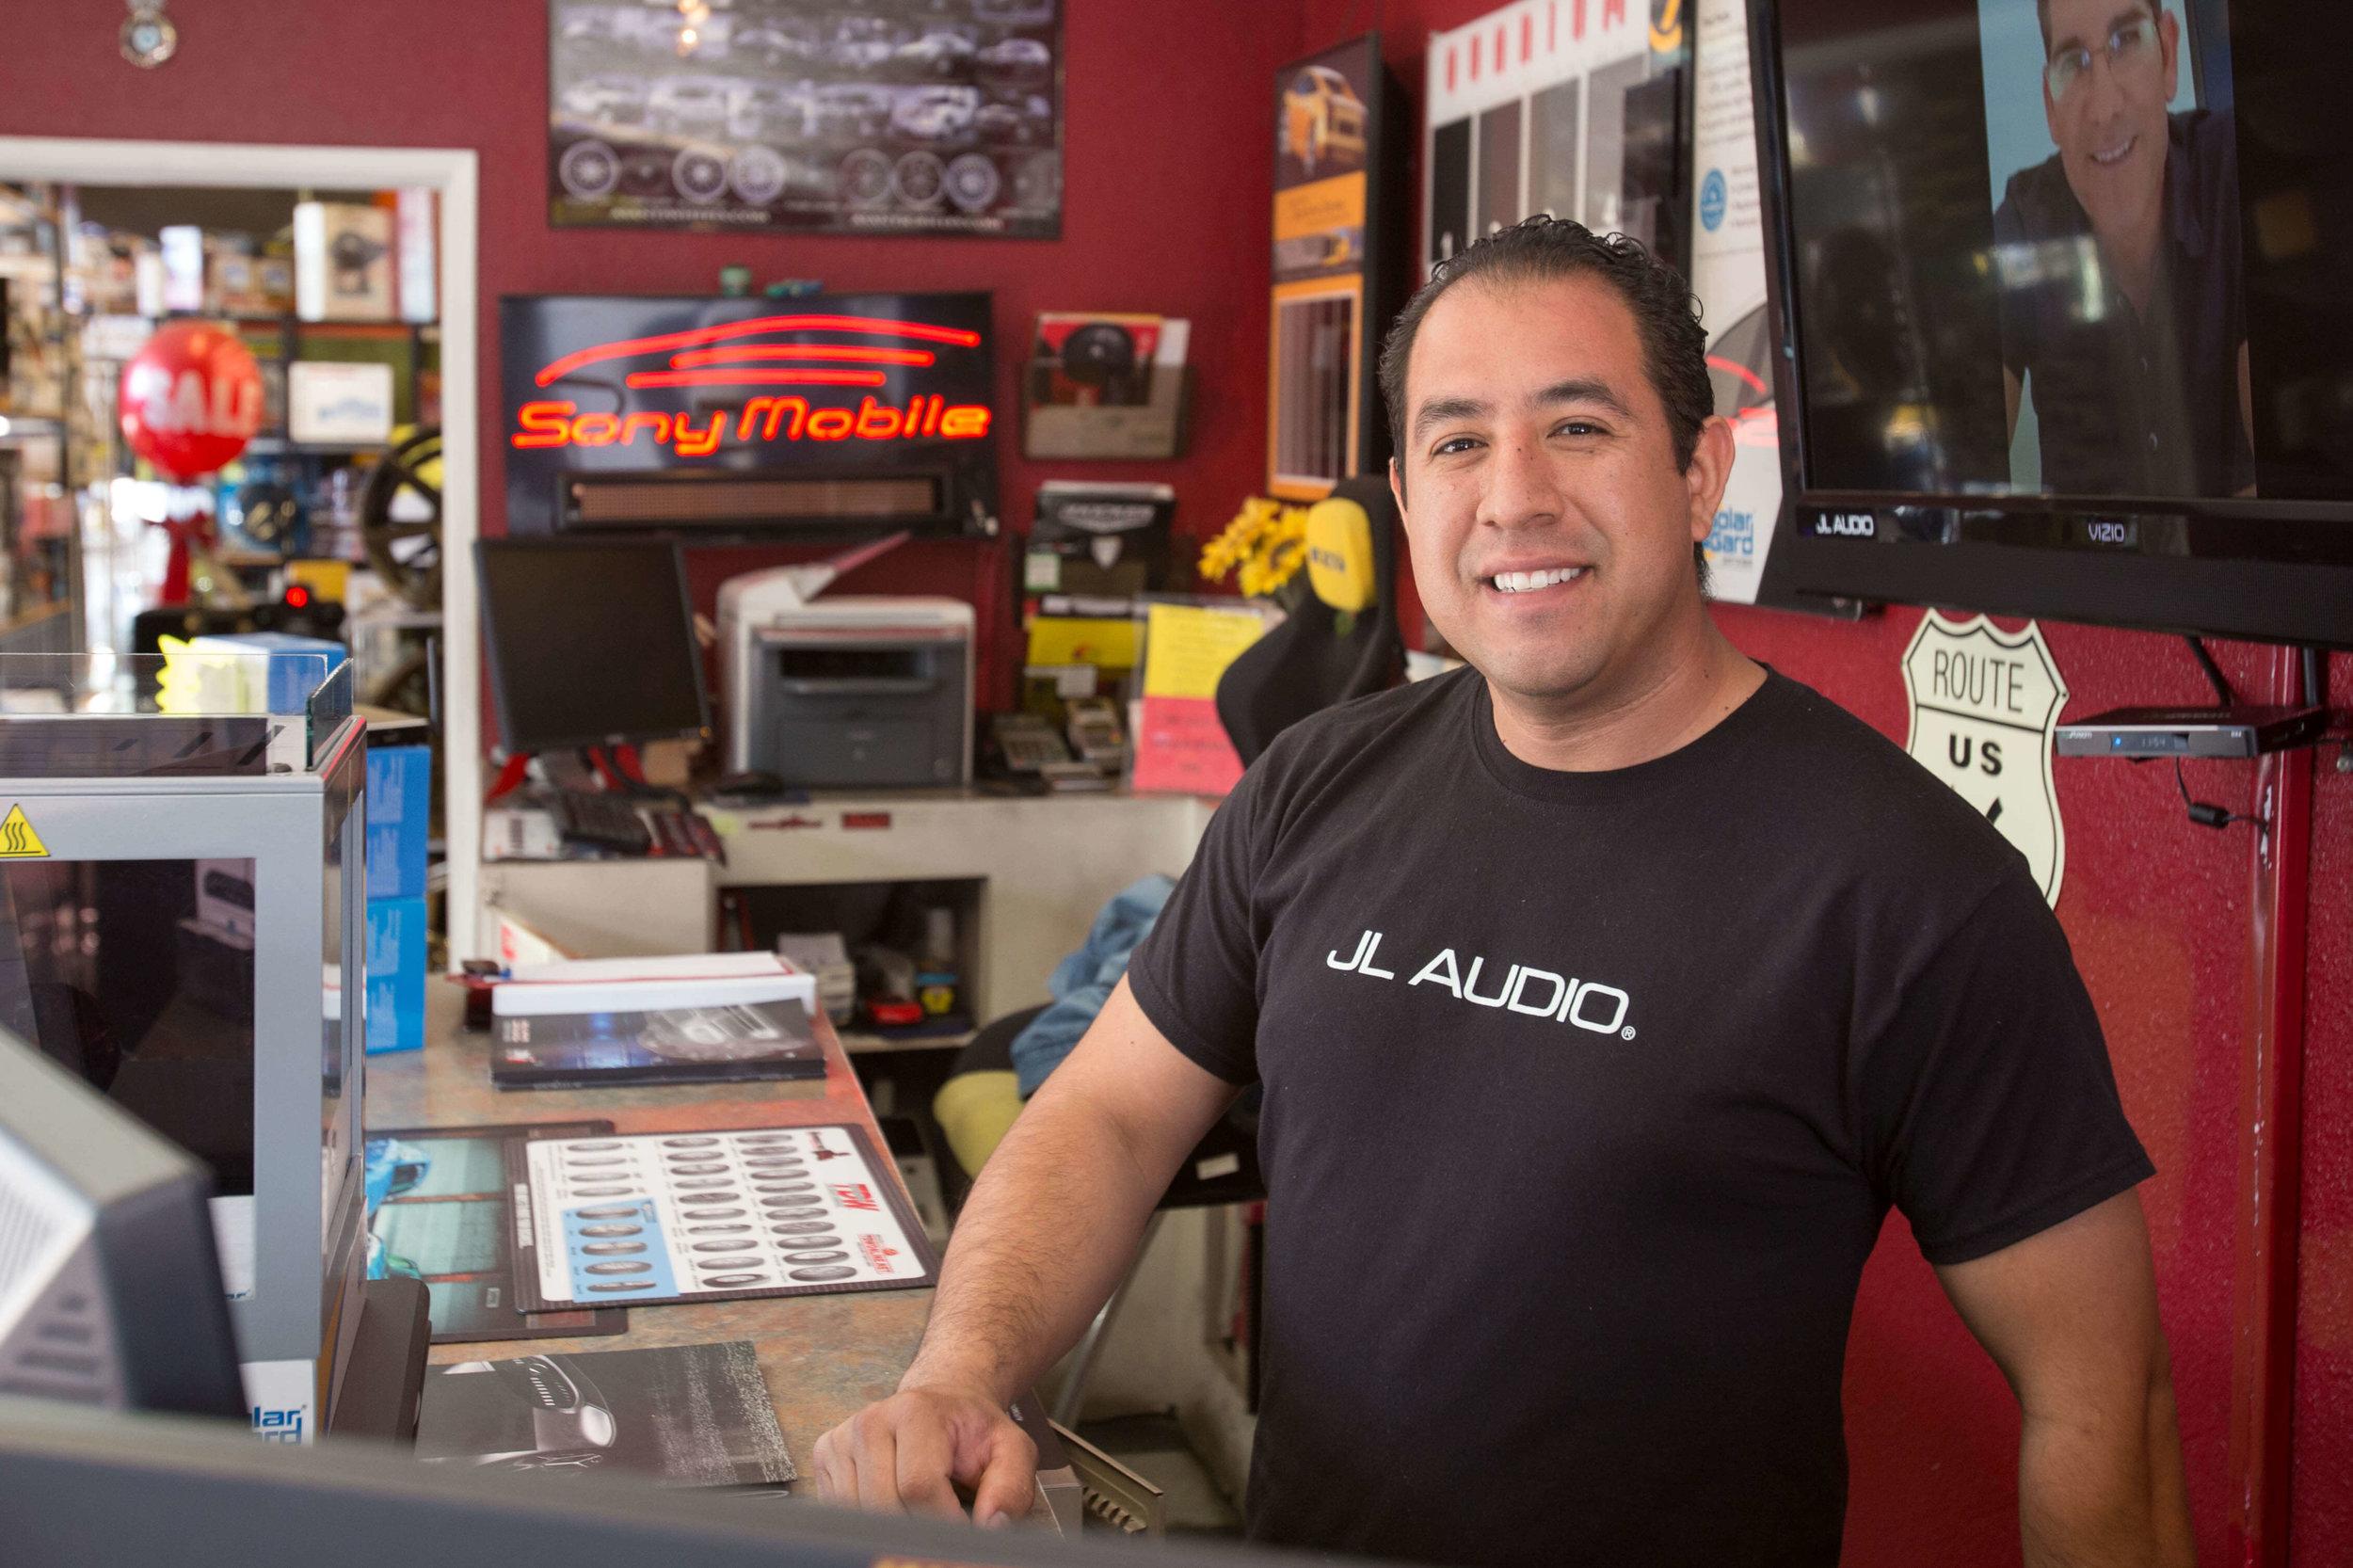 Best Customer Service at Audiosport Escondido